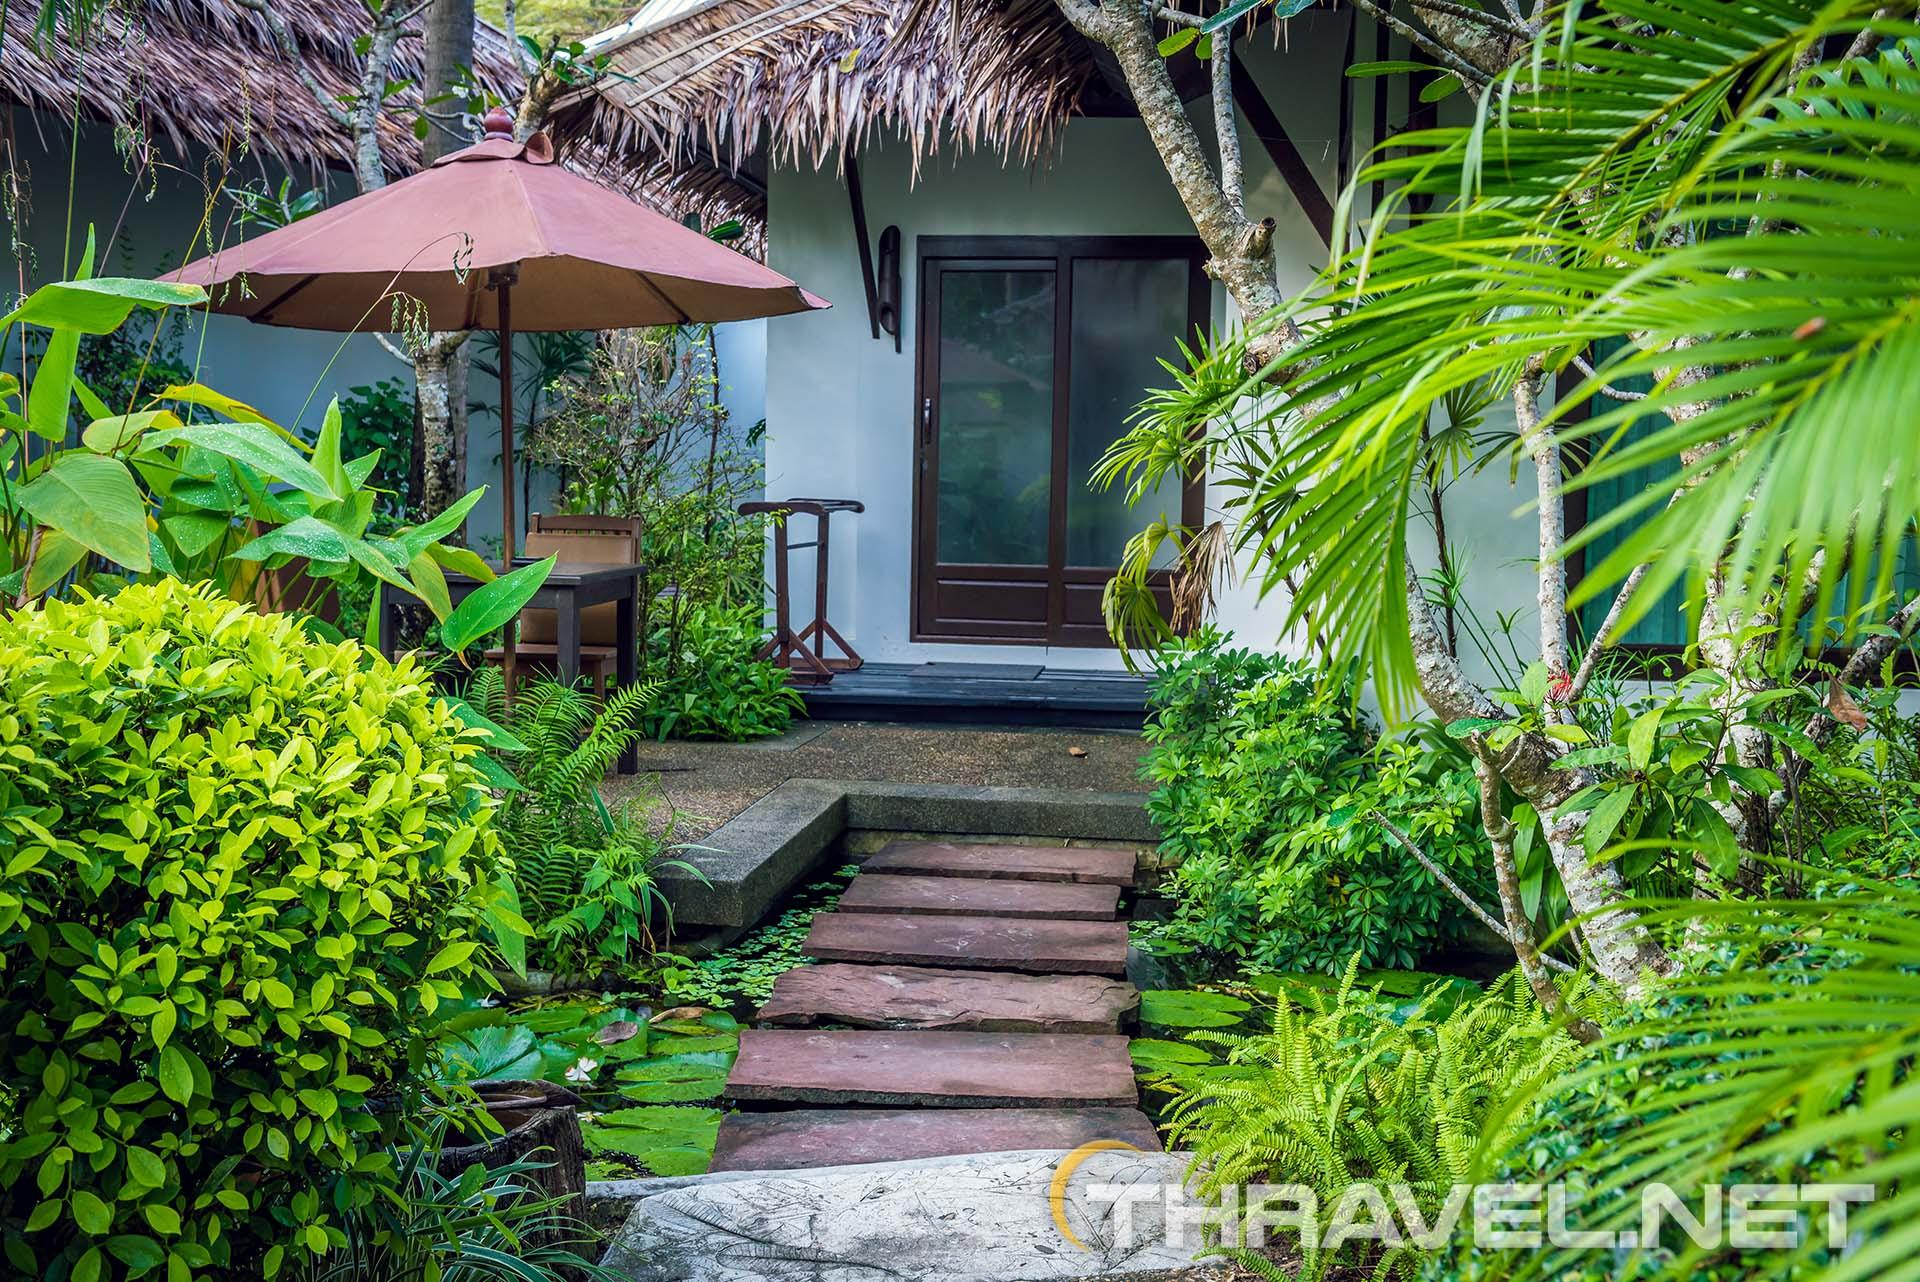 Railey-village-resort-Krabi